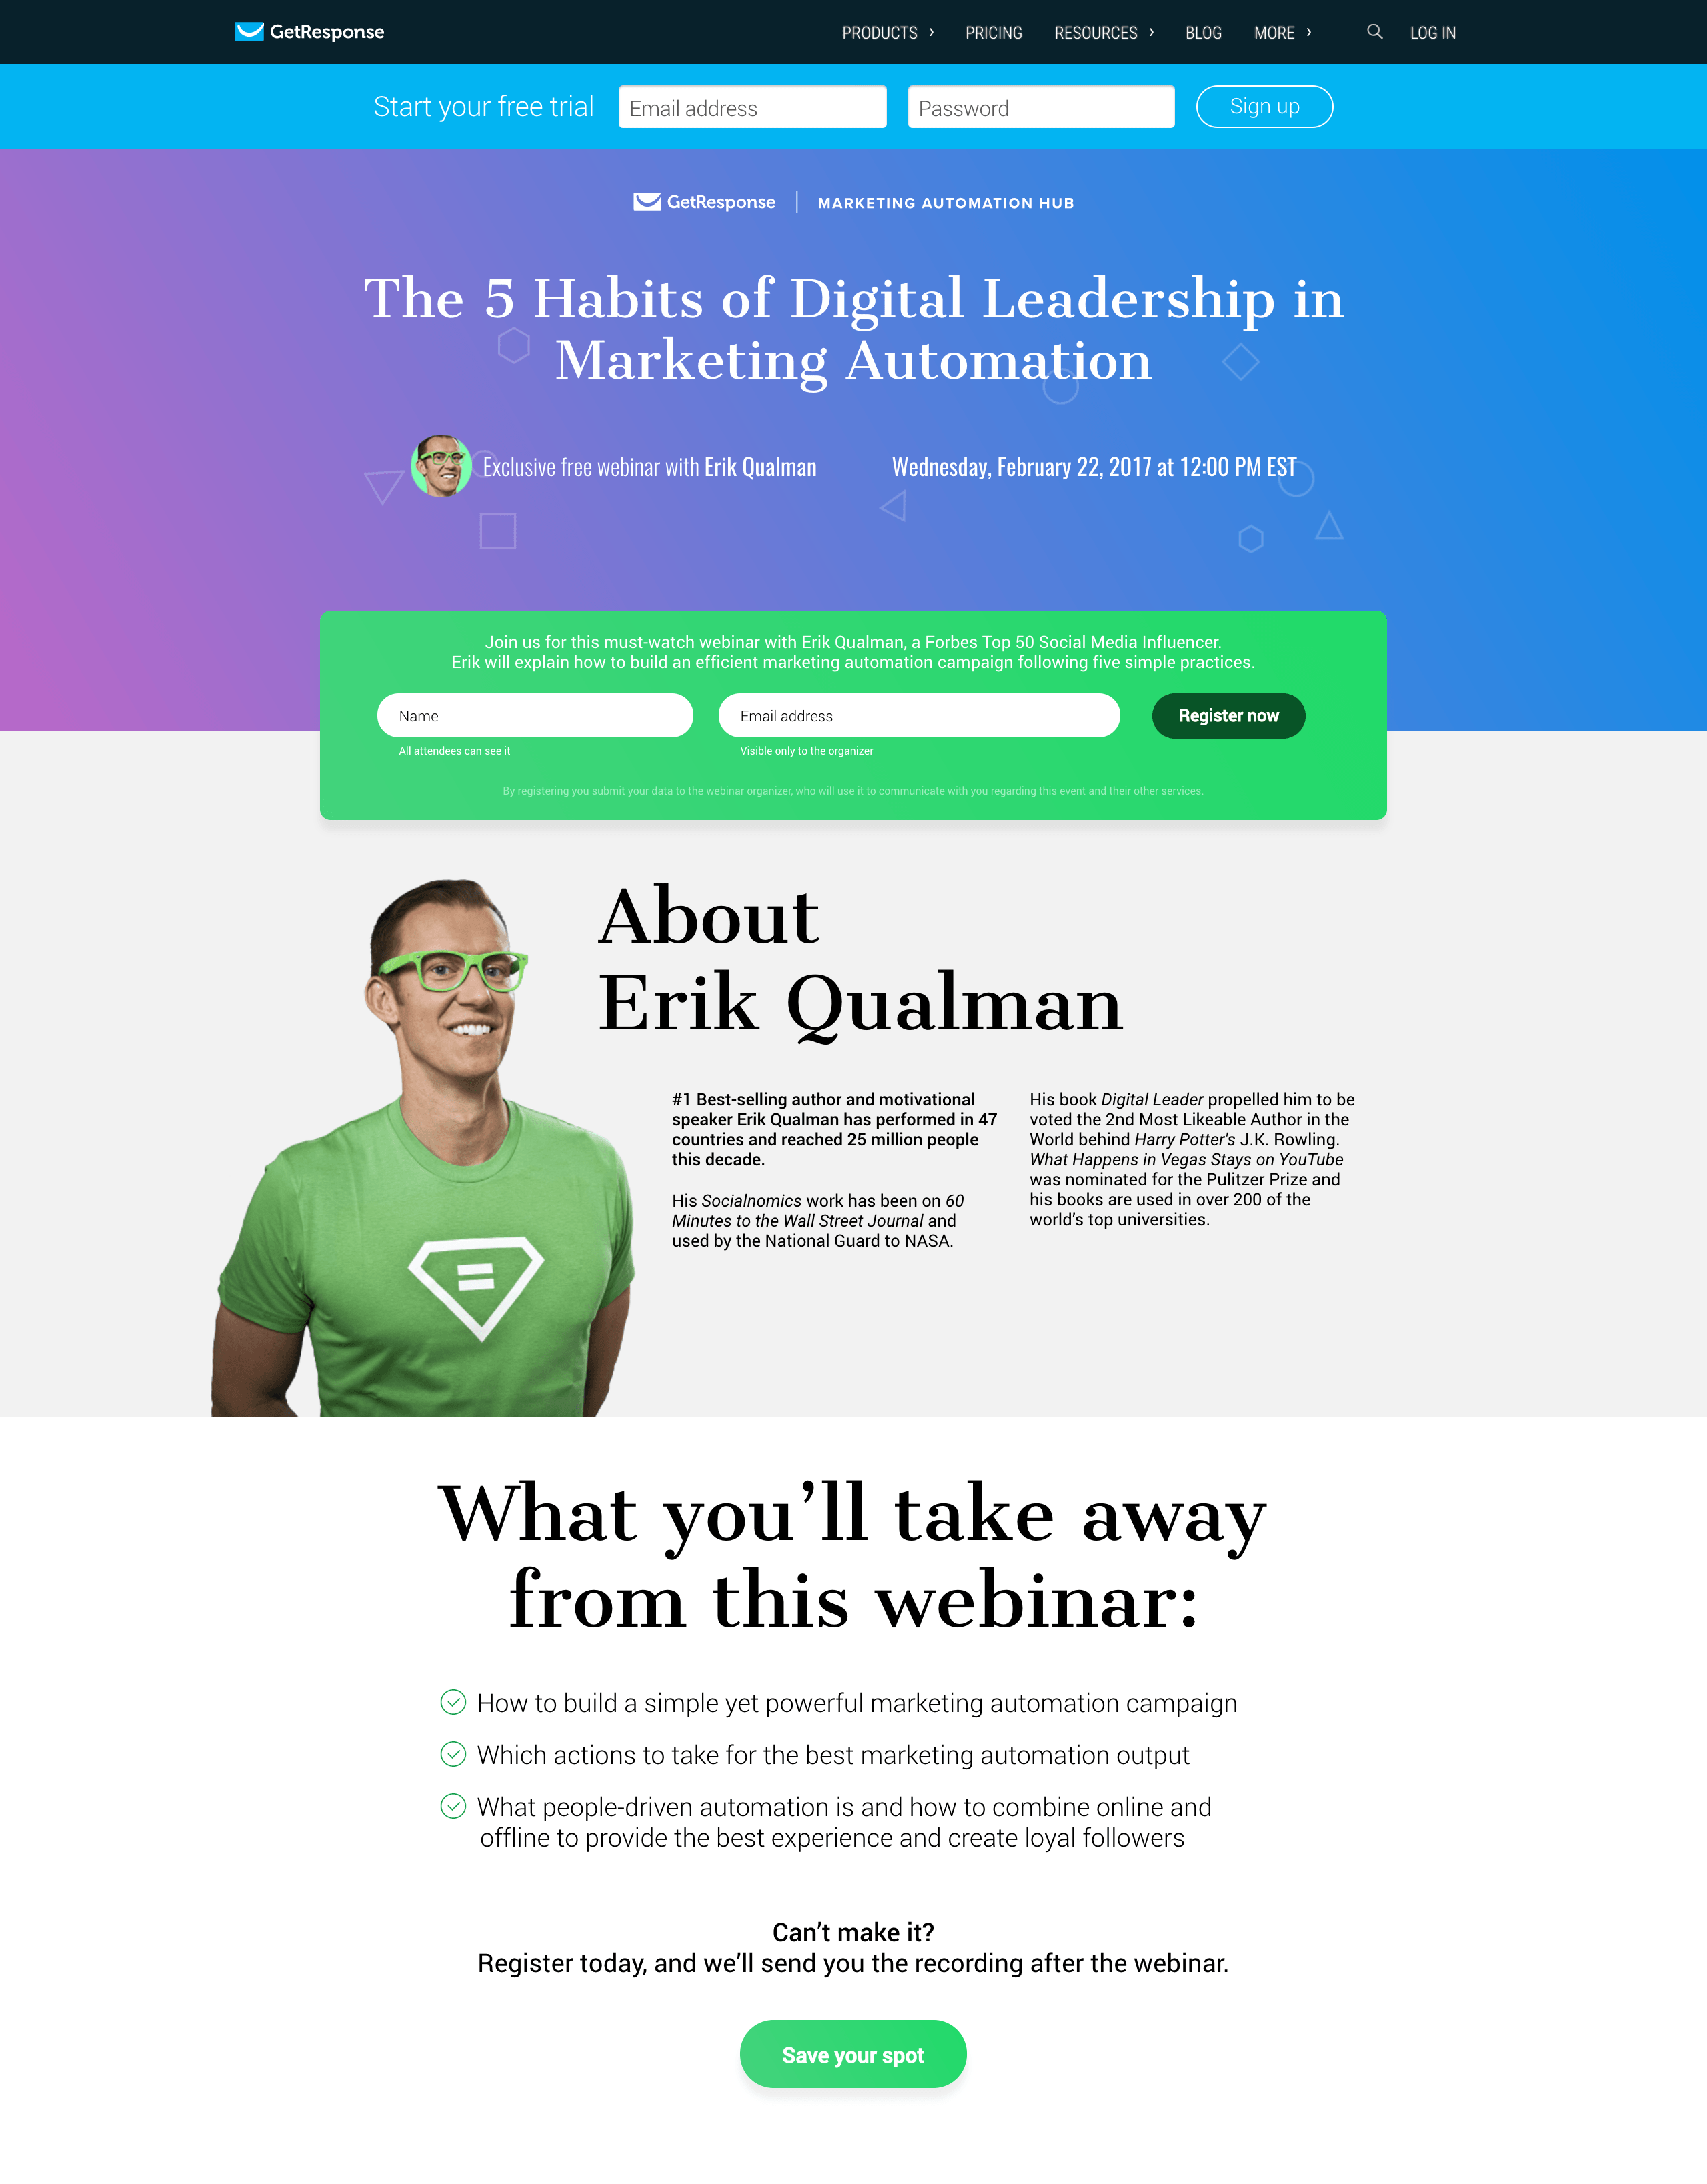 Landing page promoting a webinar with Erik Qualman